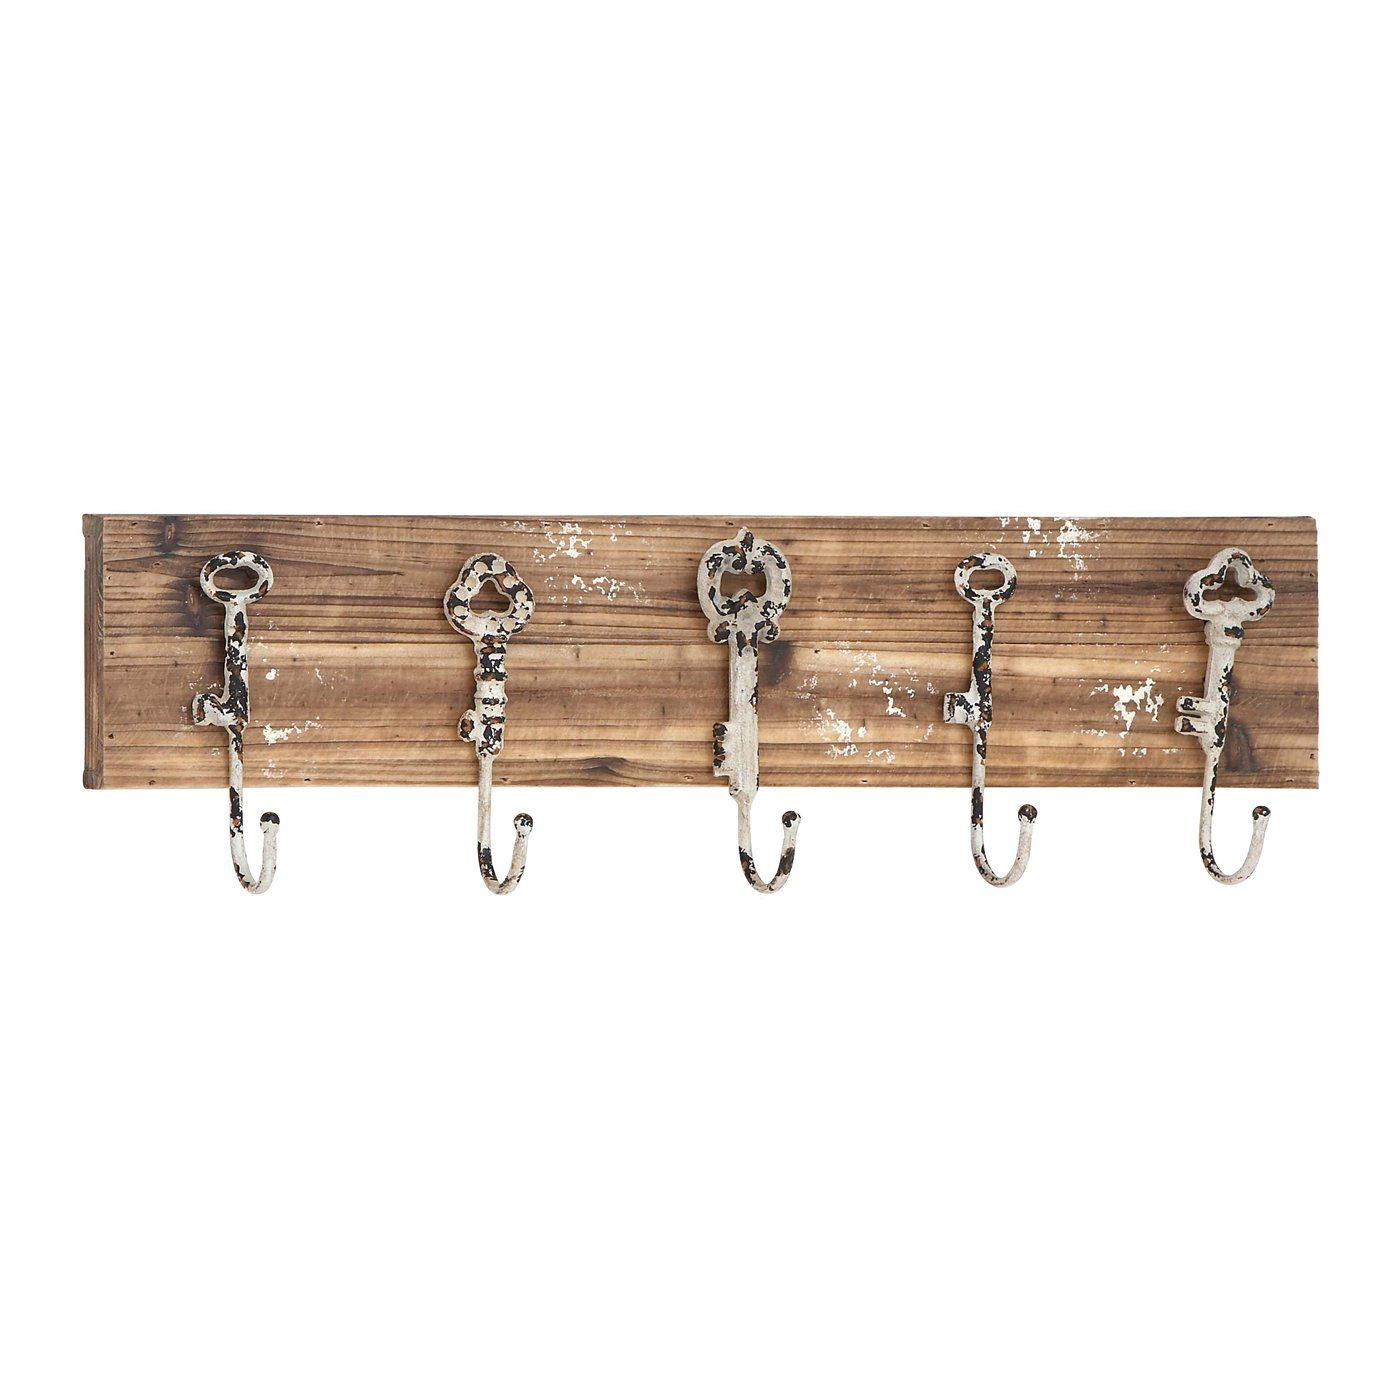 Woodland Imports 55462 Modern Metal and Wood Wall Coat Rack